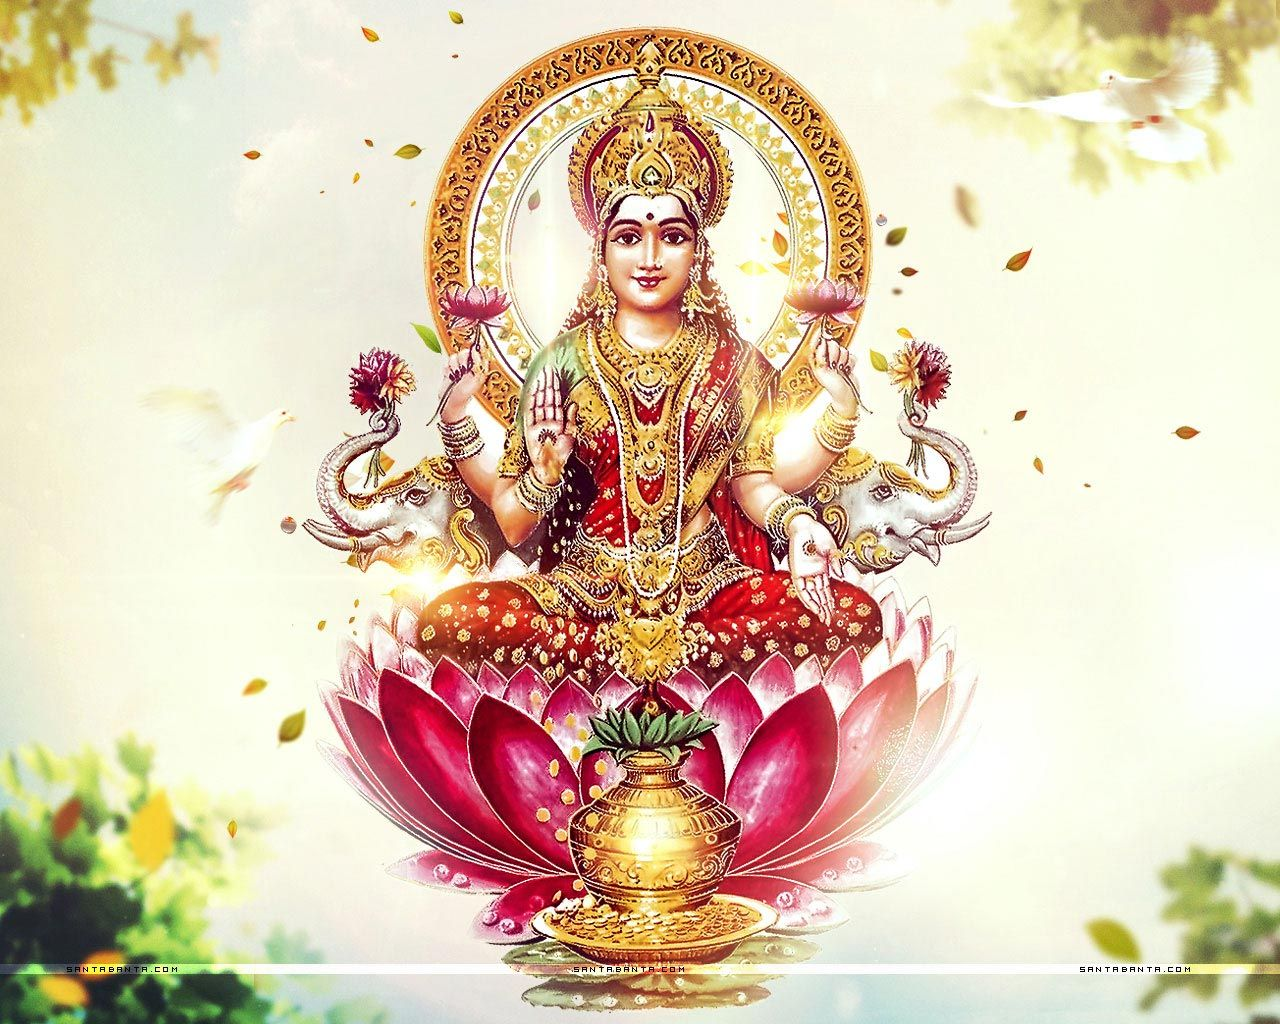 Goddess Laxmi HD Wallpaper Download Lakshmi images